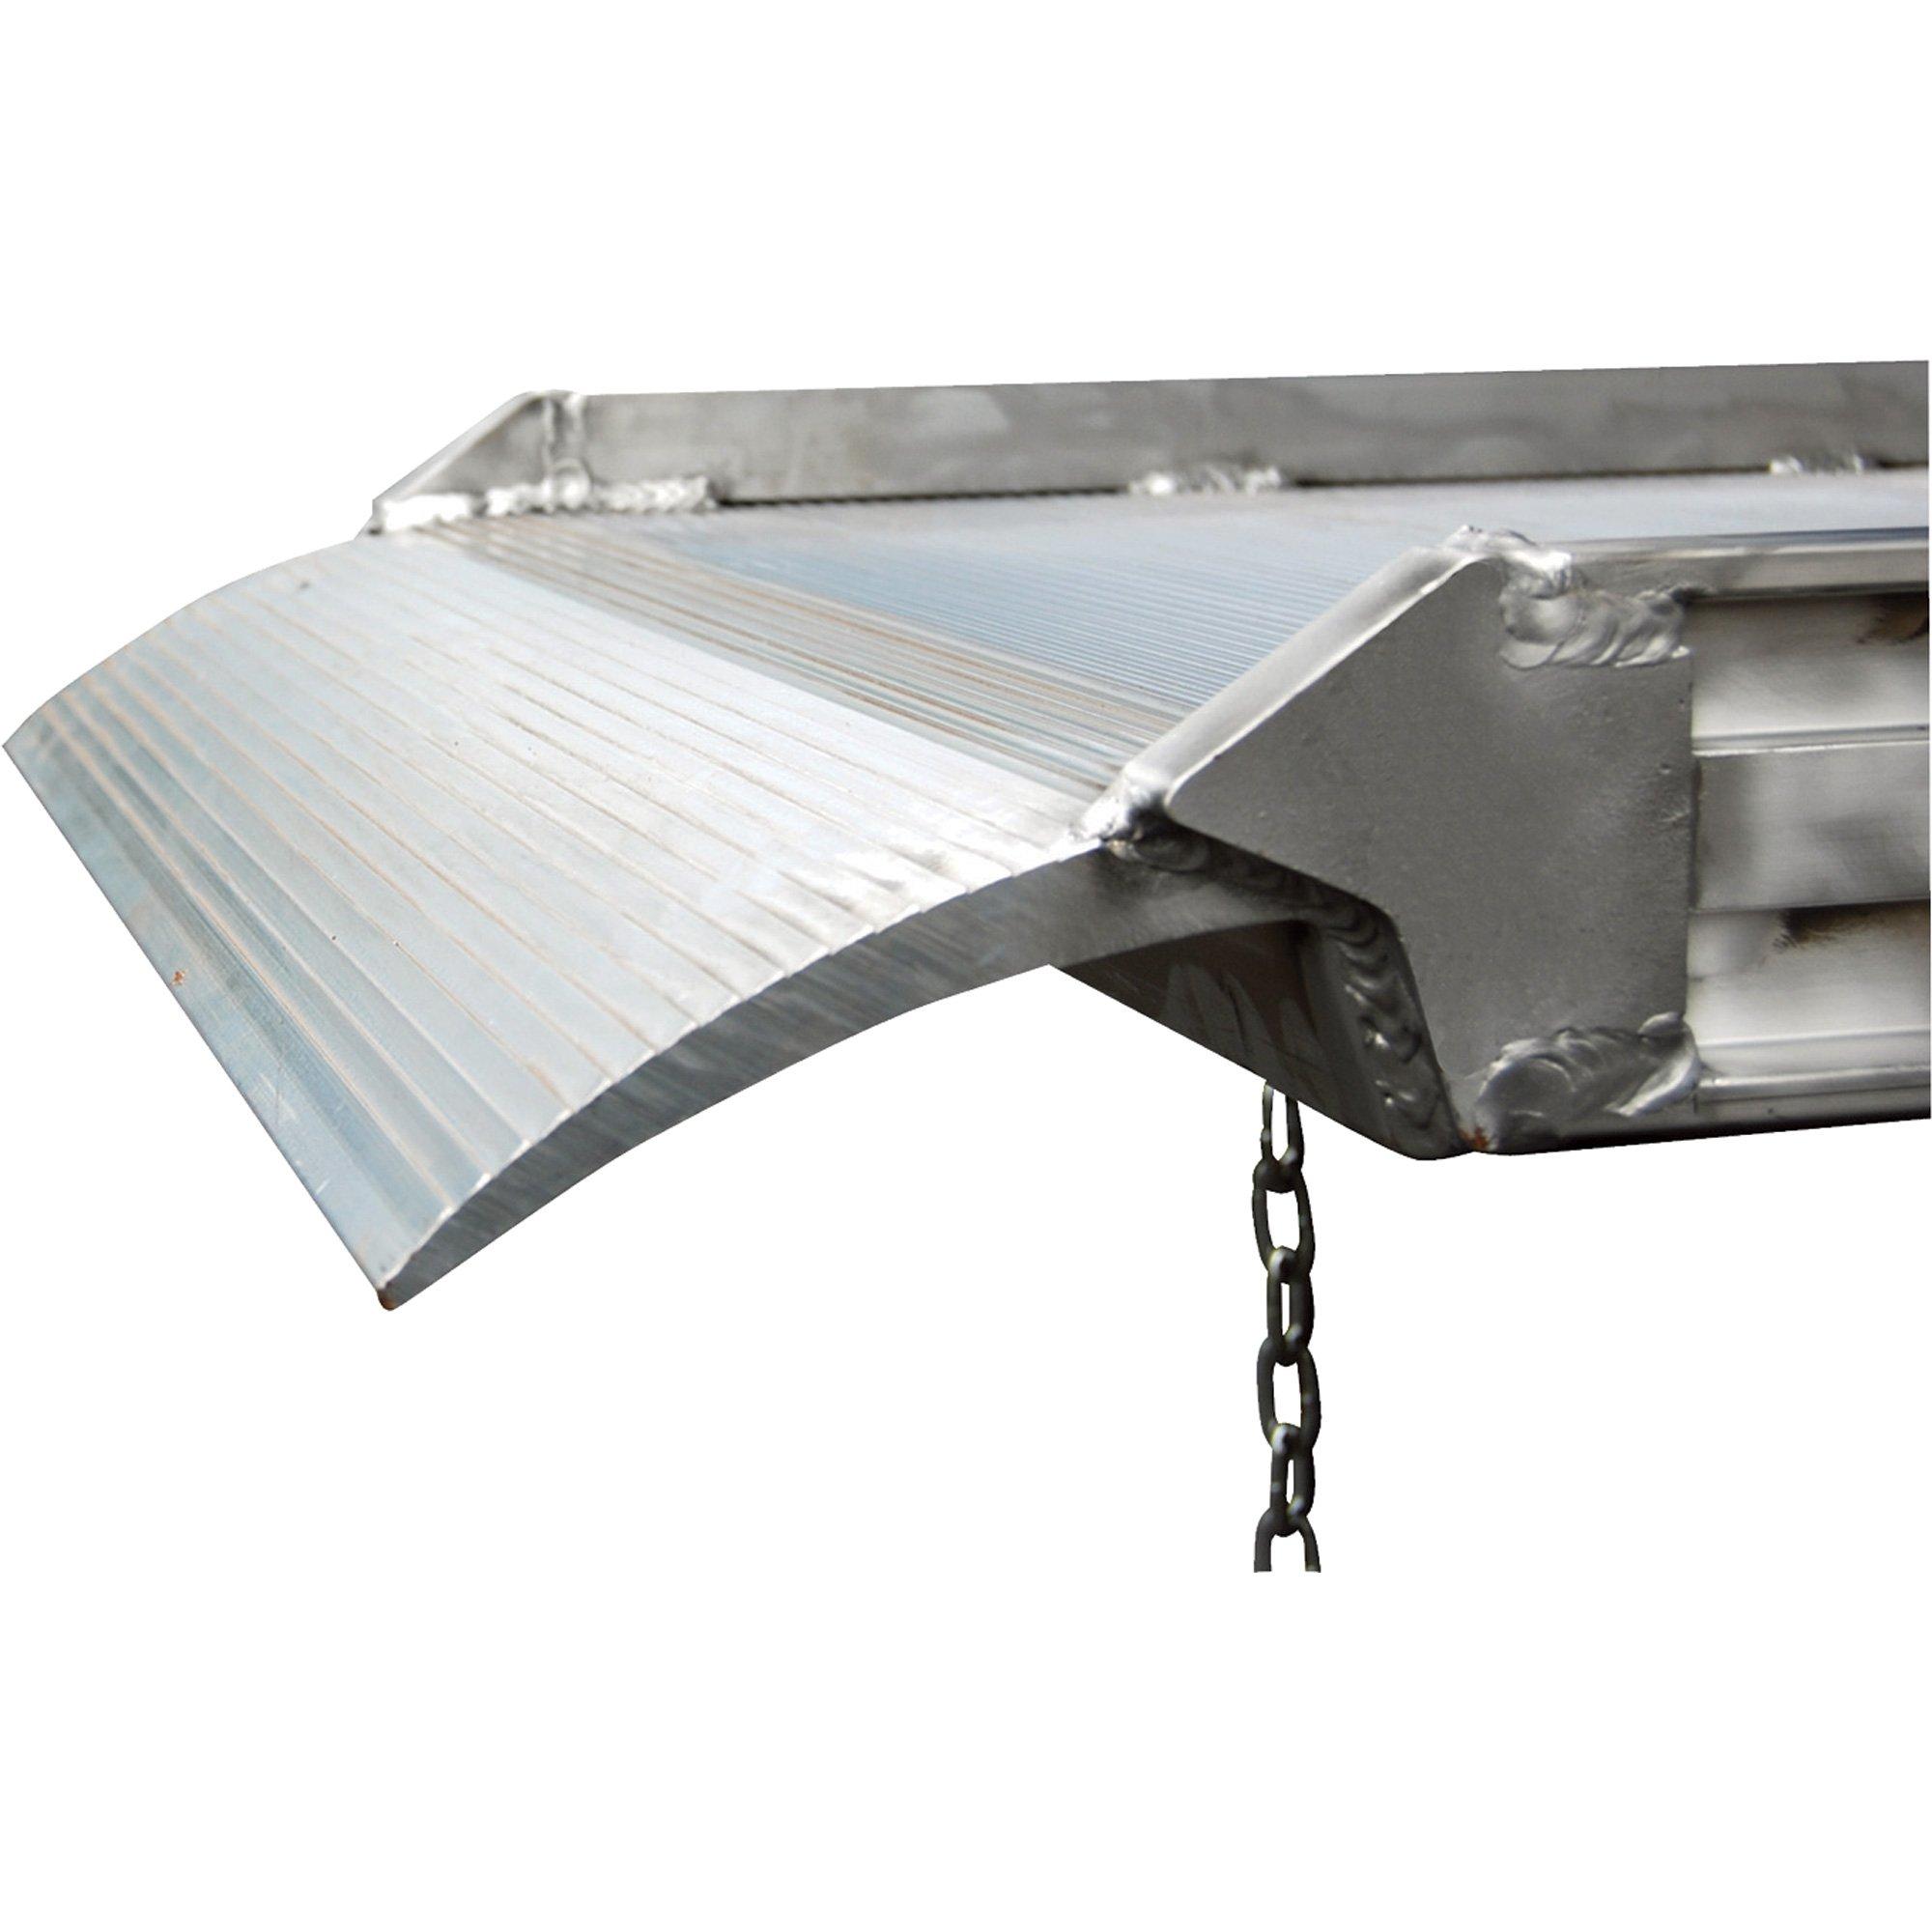 Vestil AWR-38-8A Aluminum Walk Ramp Overlap Style, 2500 lb., 96'' Length, 38'' Width, 4.75'' Height